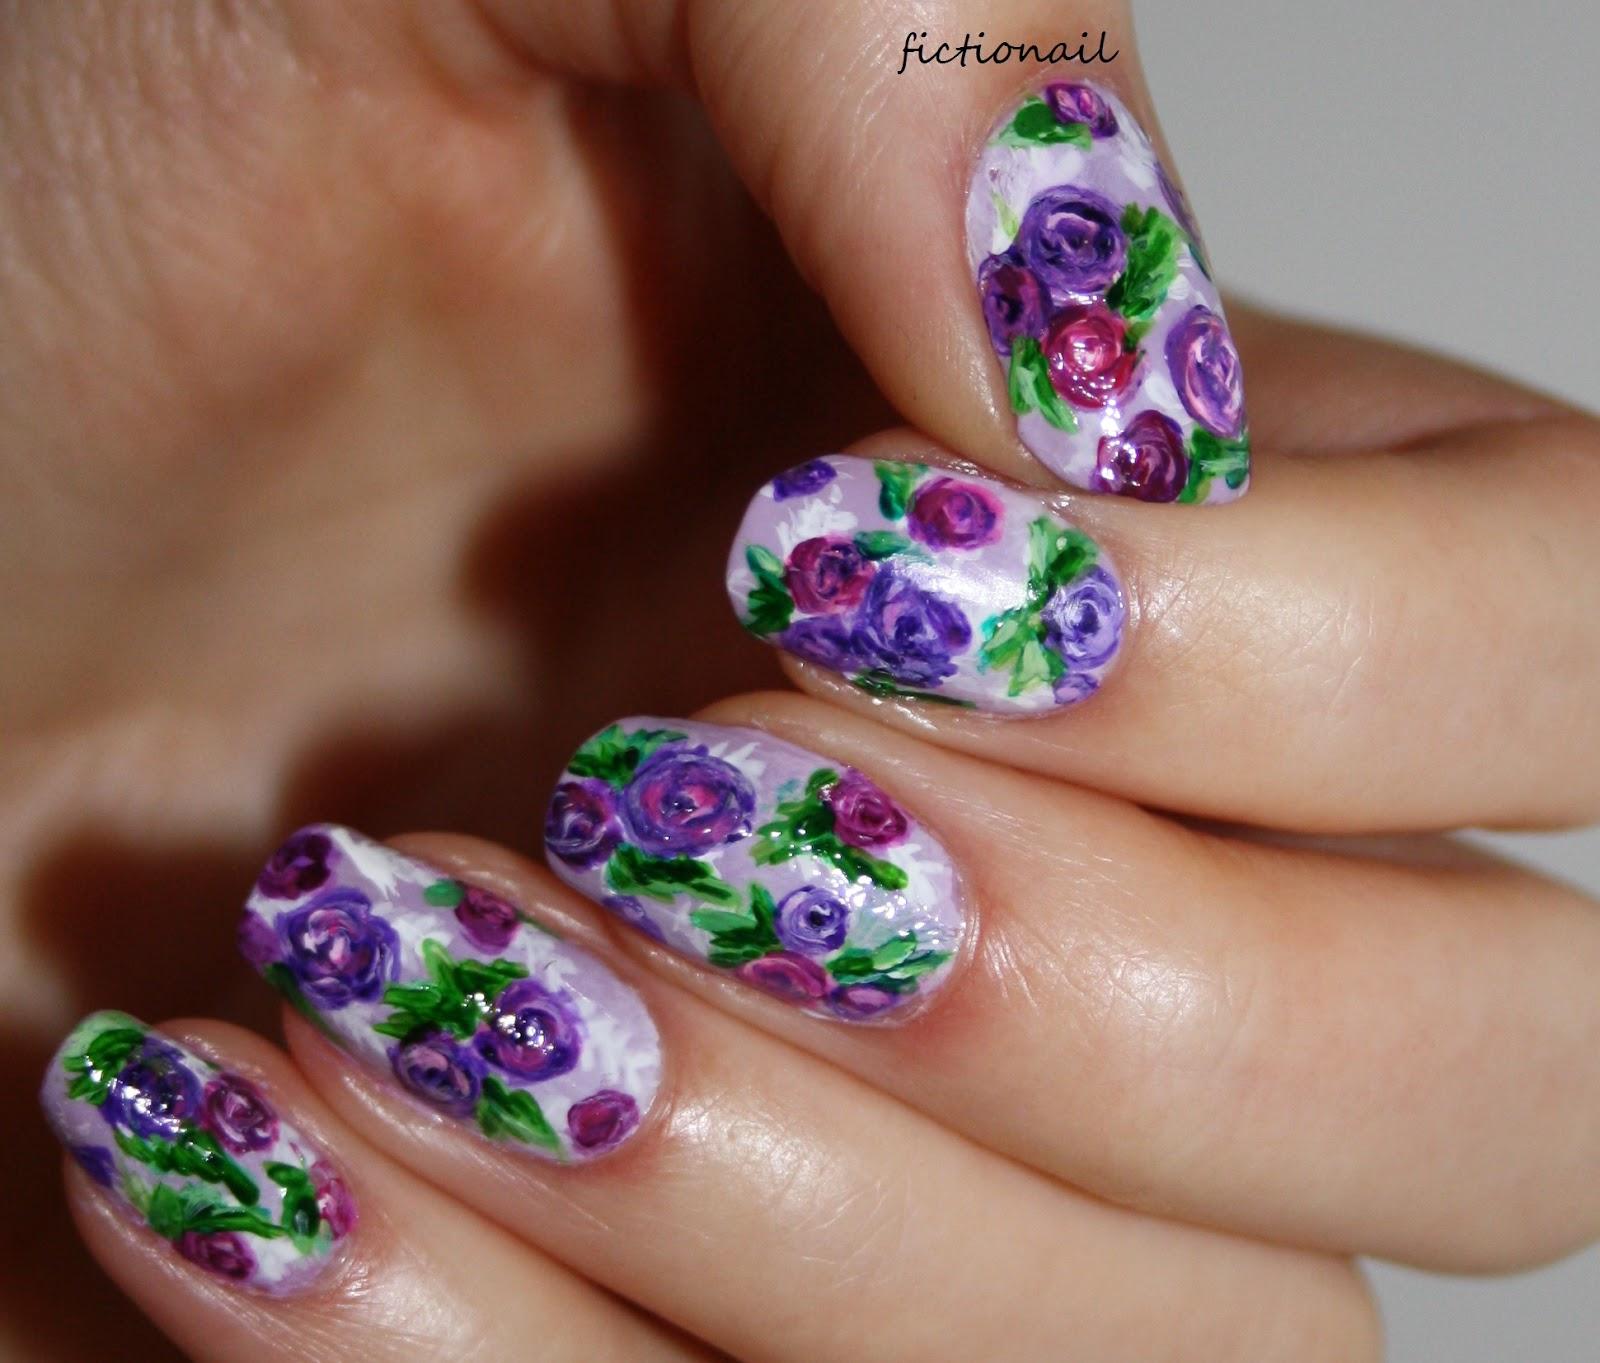 Purple Rose Nails For Cystic Fibrosis Awareness